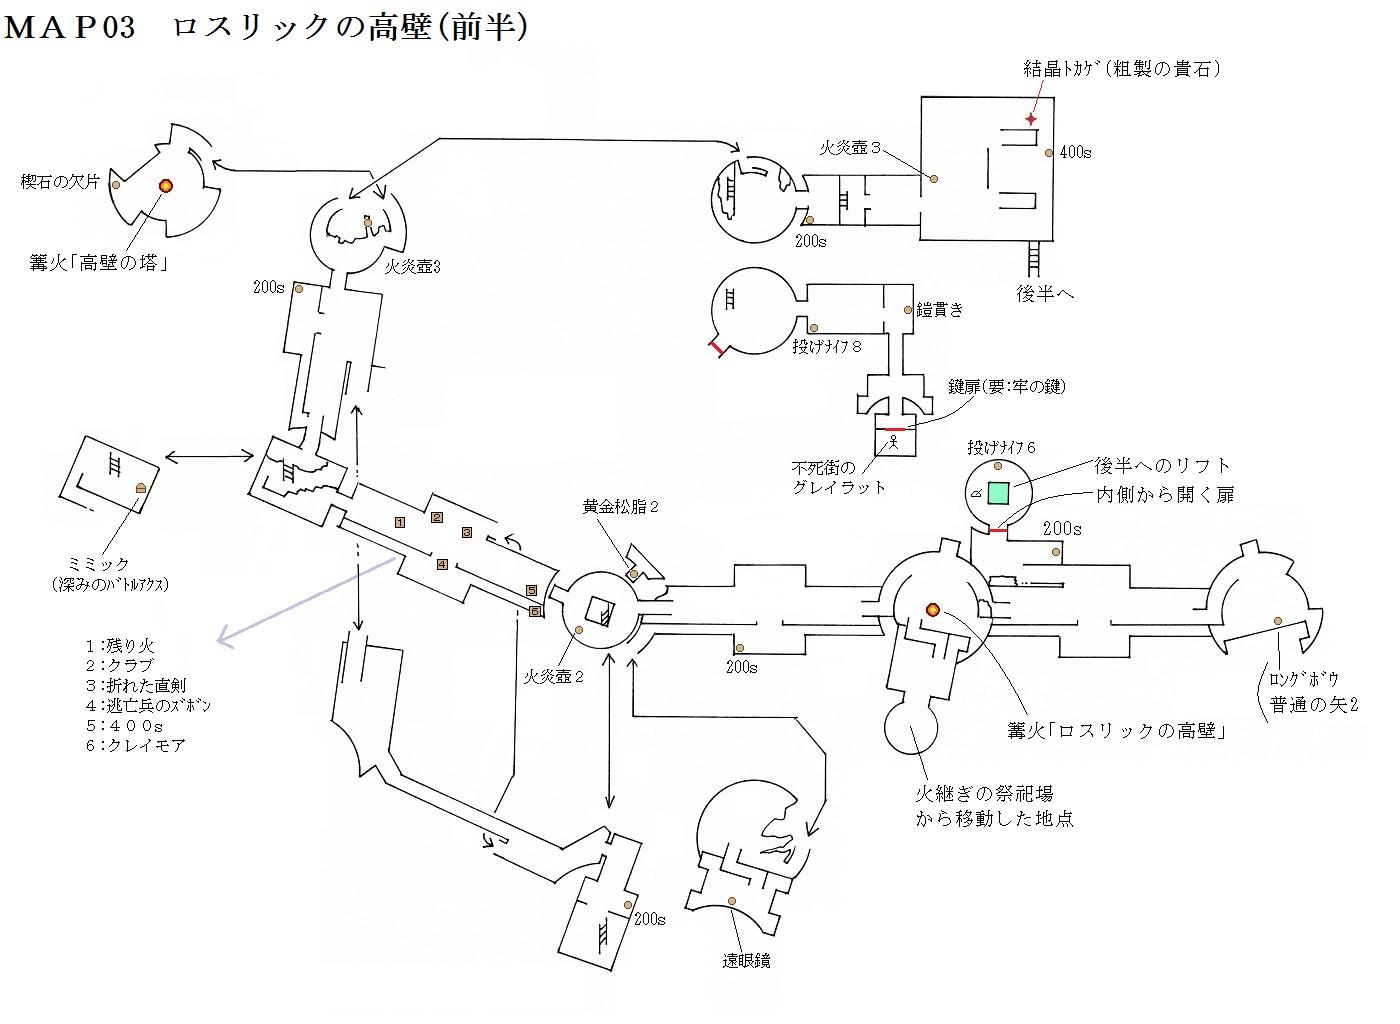 Wiki 3 ダーク ソウル